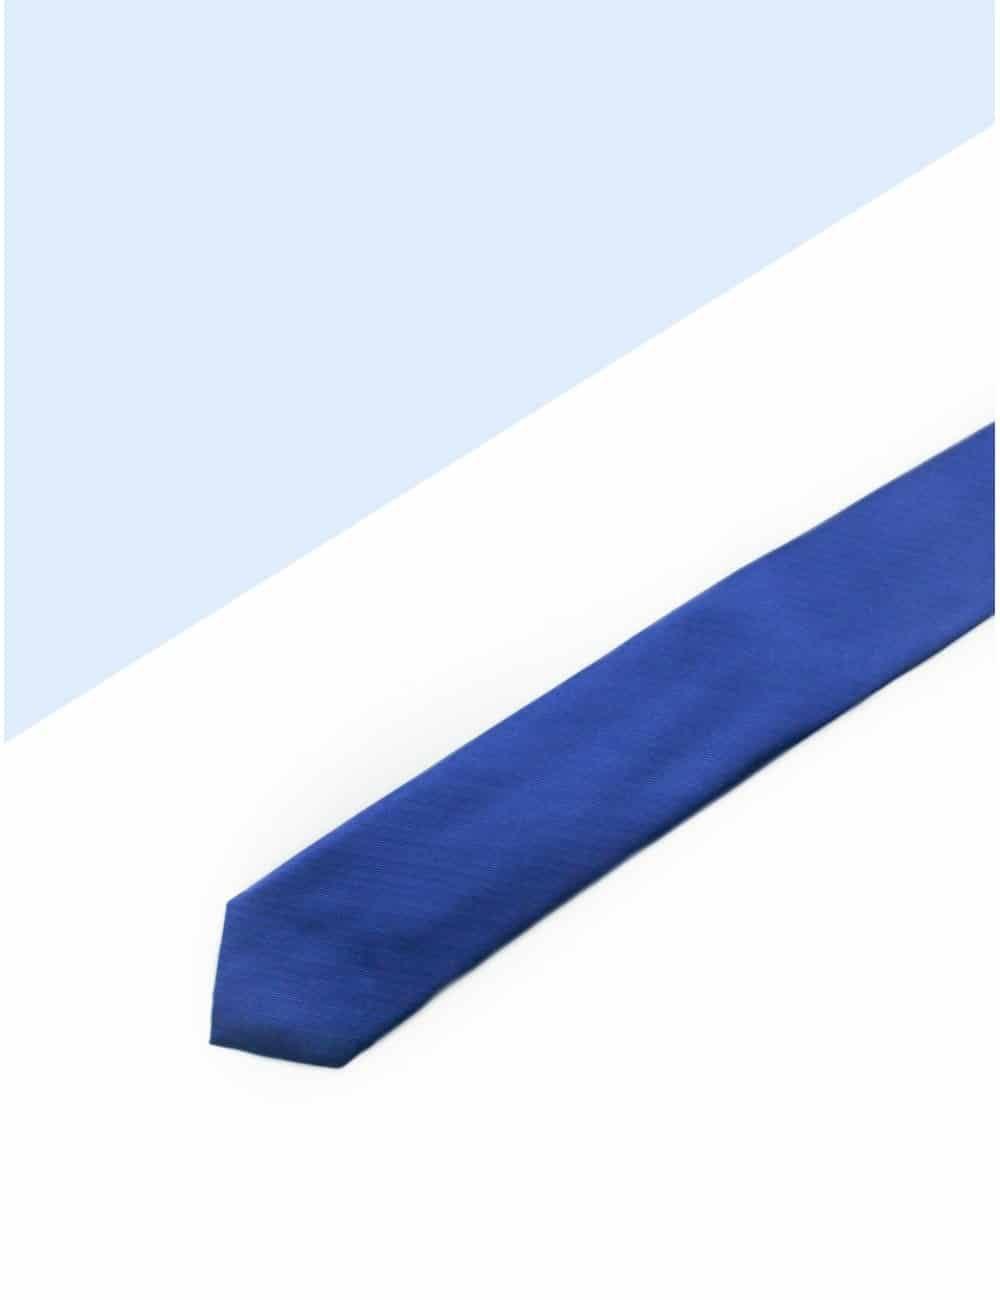 Solid Bright Blue Woven Necktie NT10.7